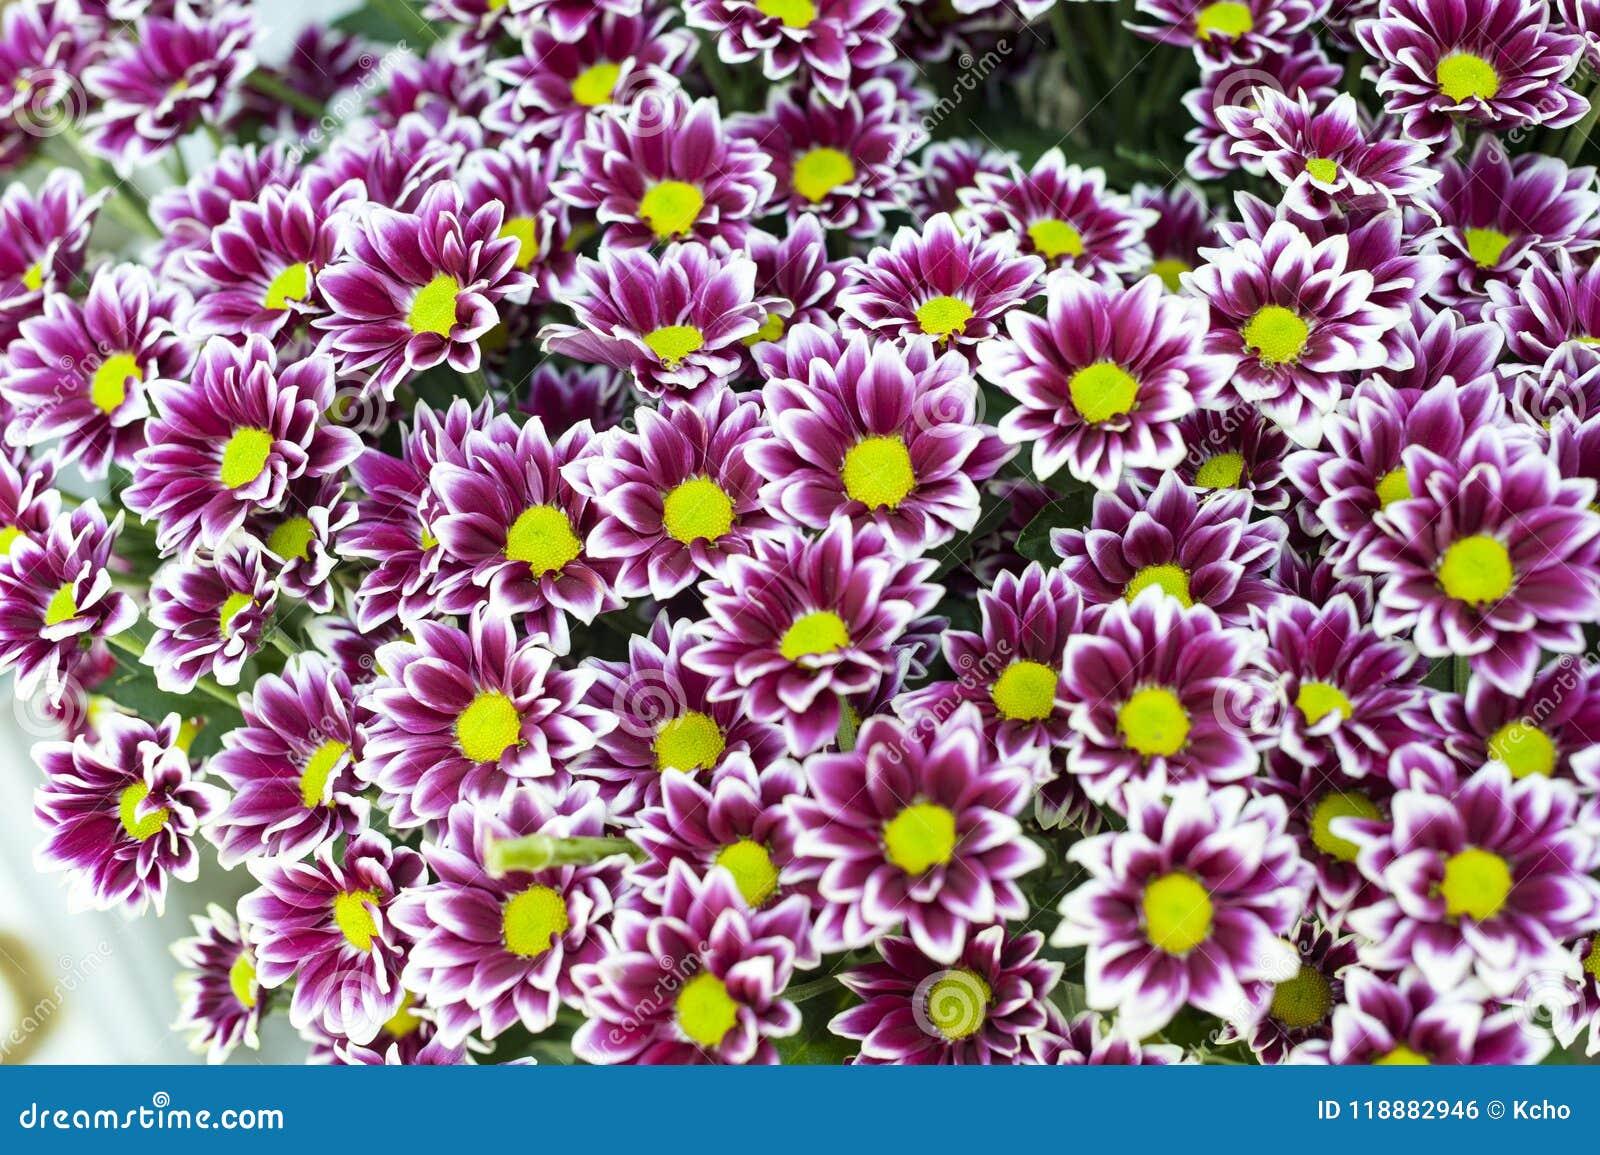 Purple Flowers Bunch Stock Photo Image Of Flowers Farm 118882946